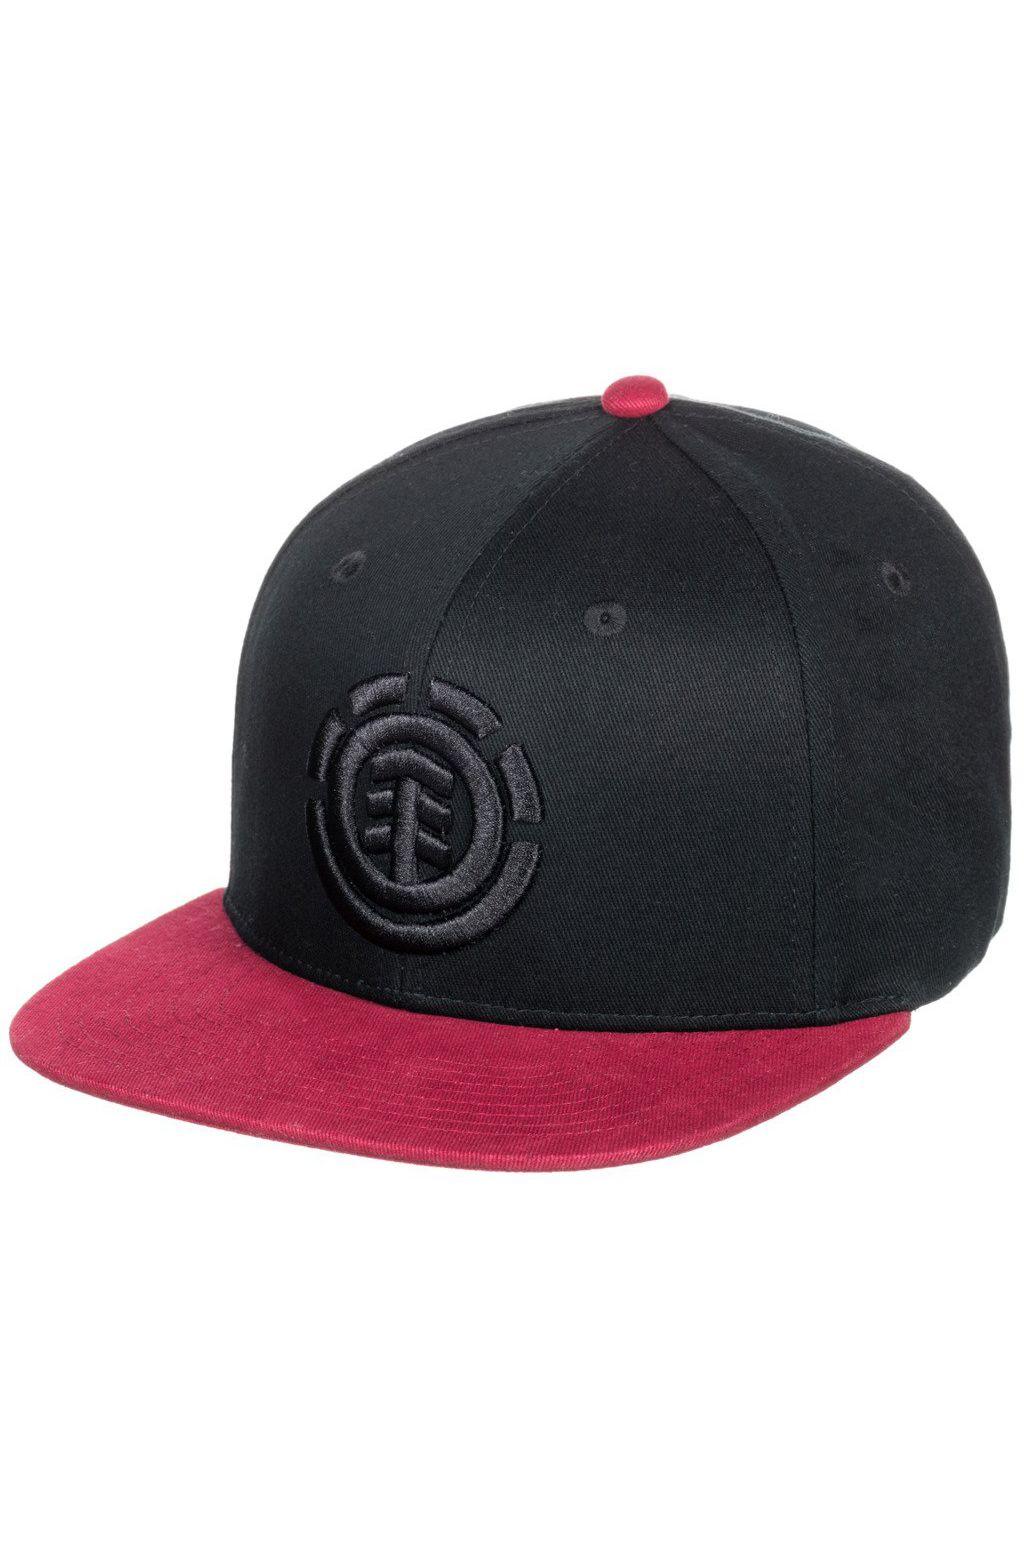 Element Cap   KNUTSEN CAP Black Heather